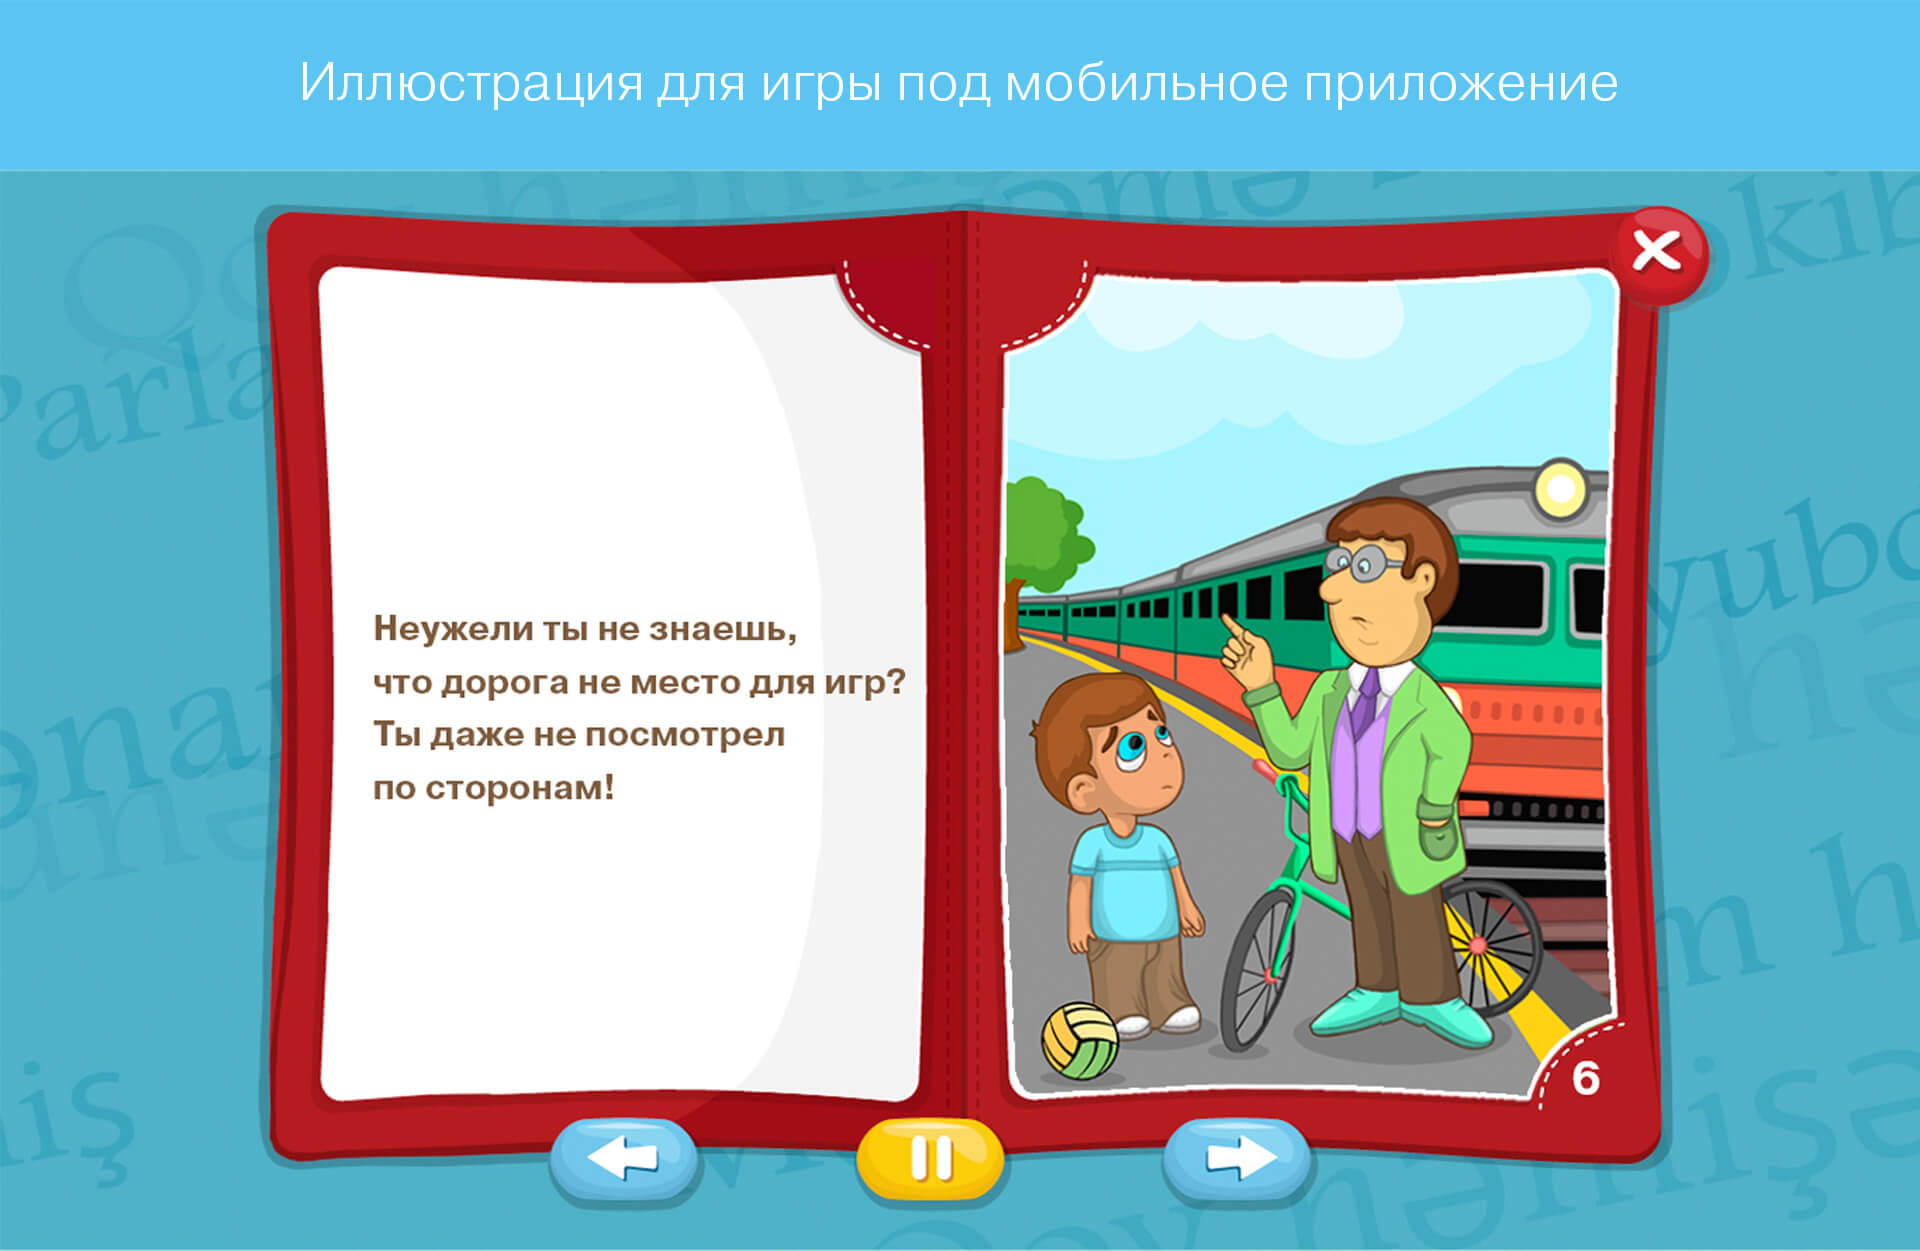 Prokochuk_Irina_Illustration_a game_1